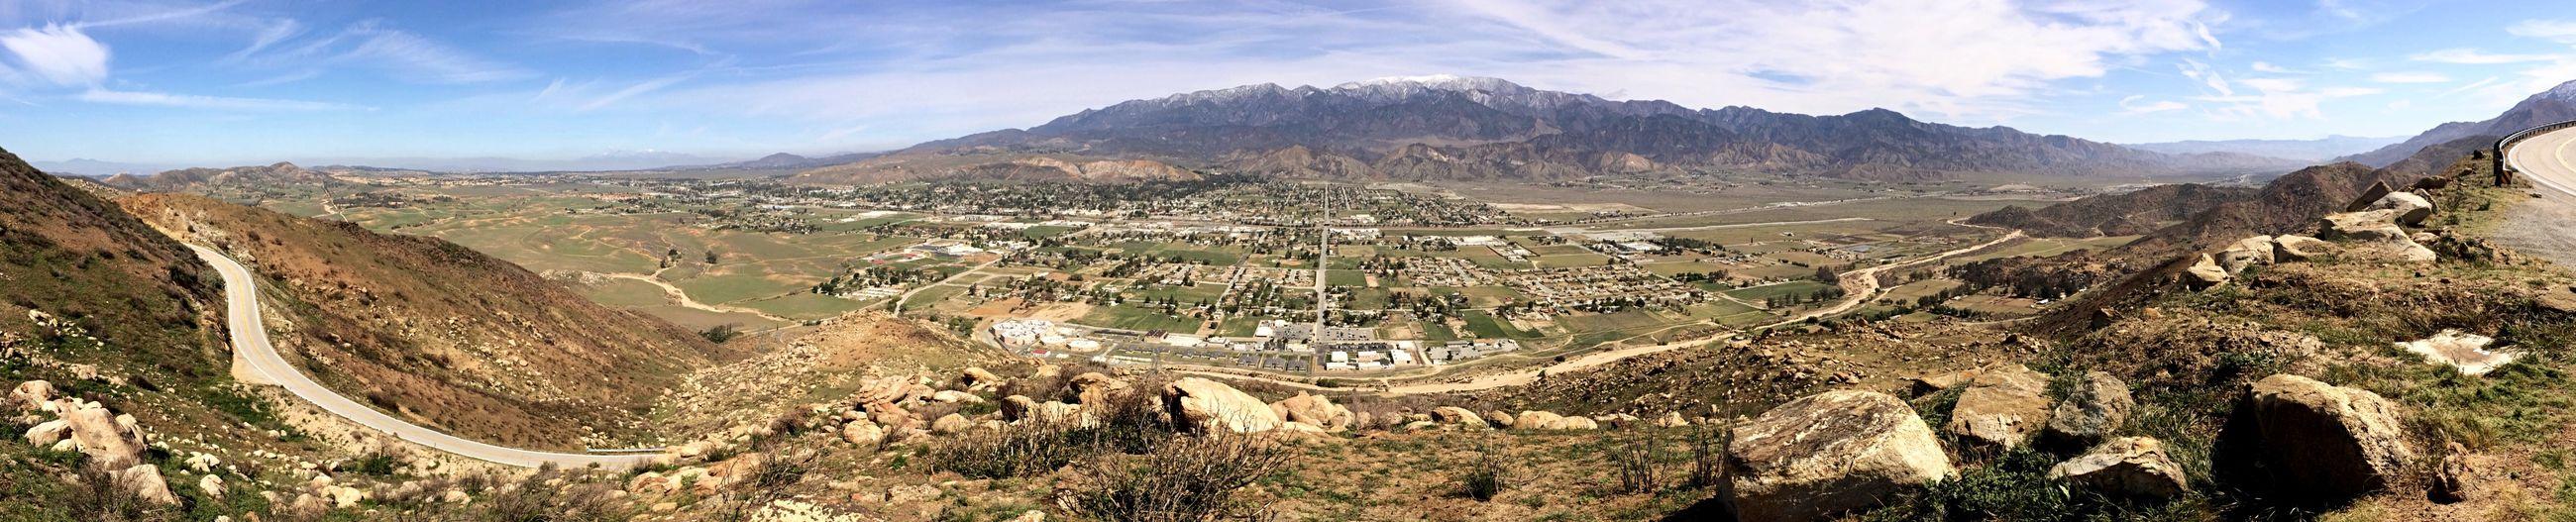 Panoramic Photography Panorama